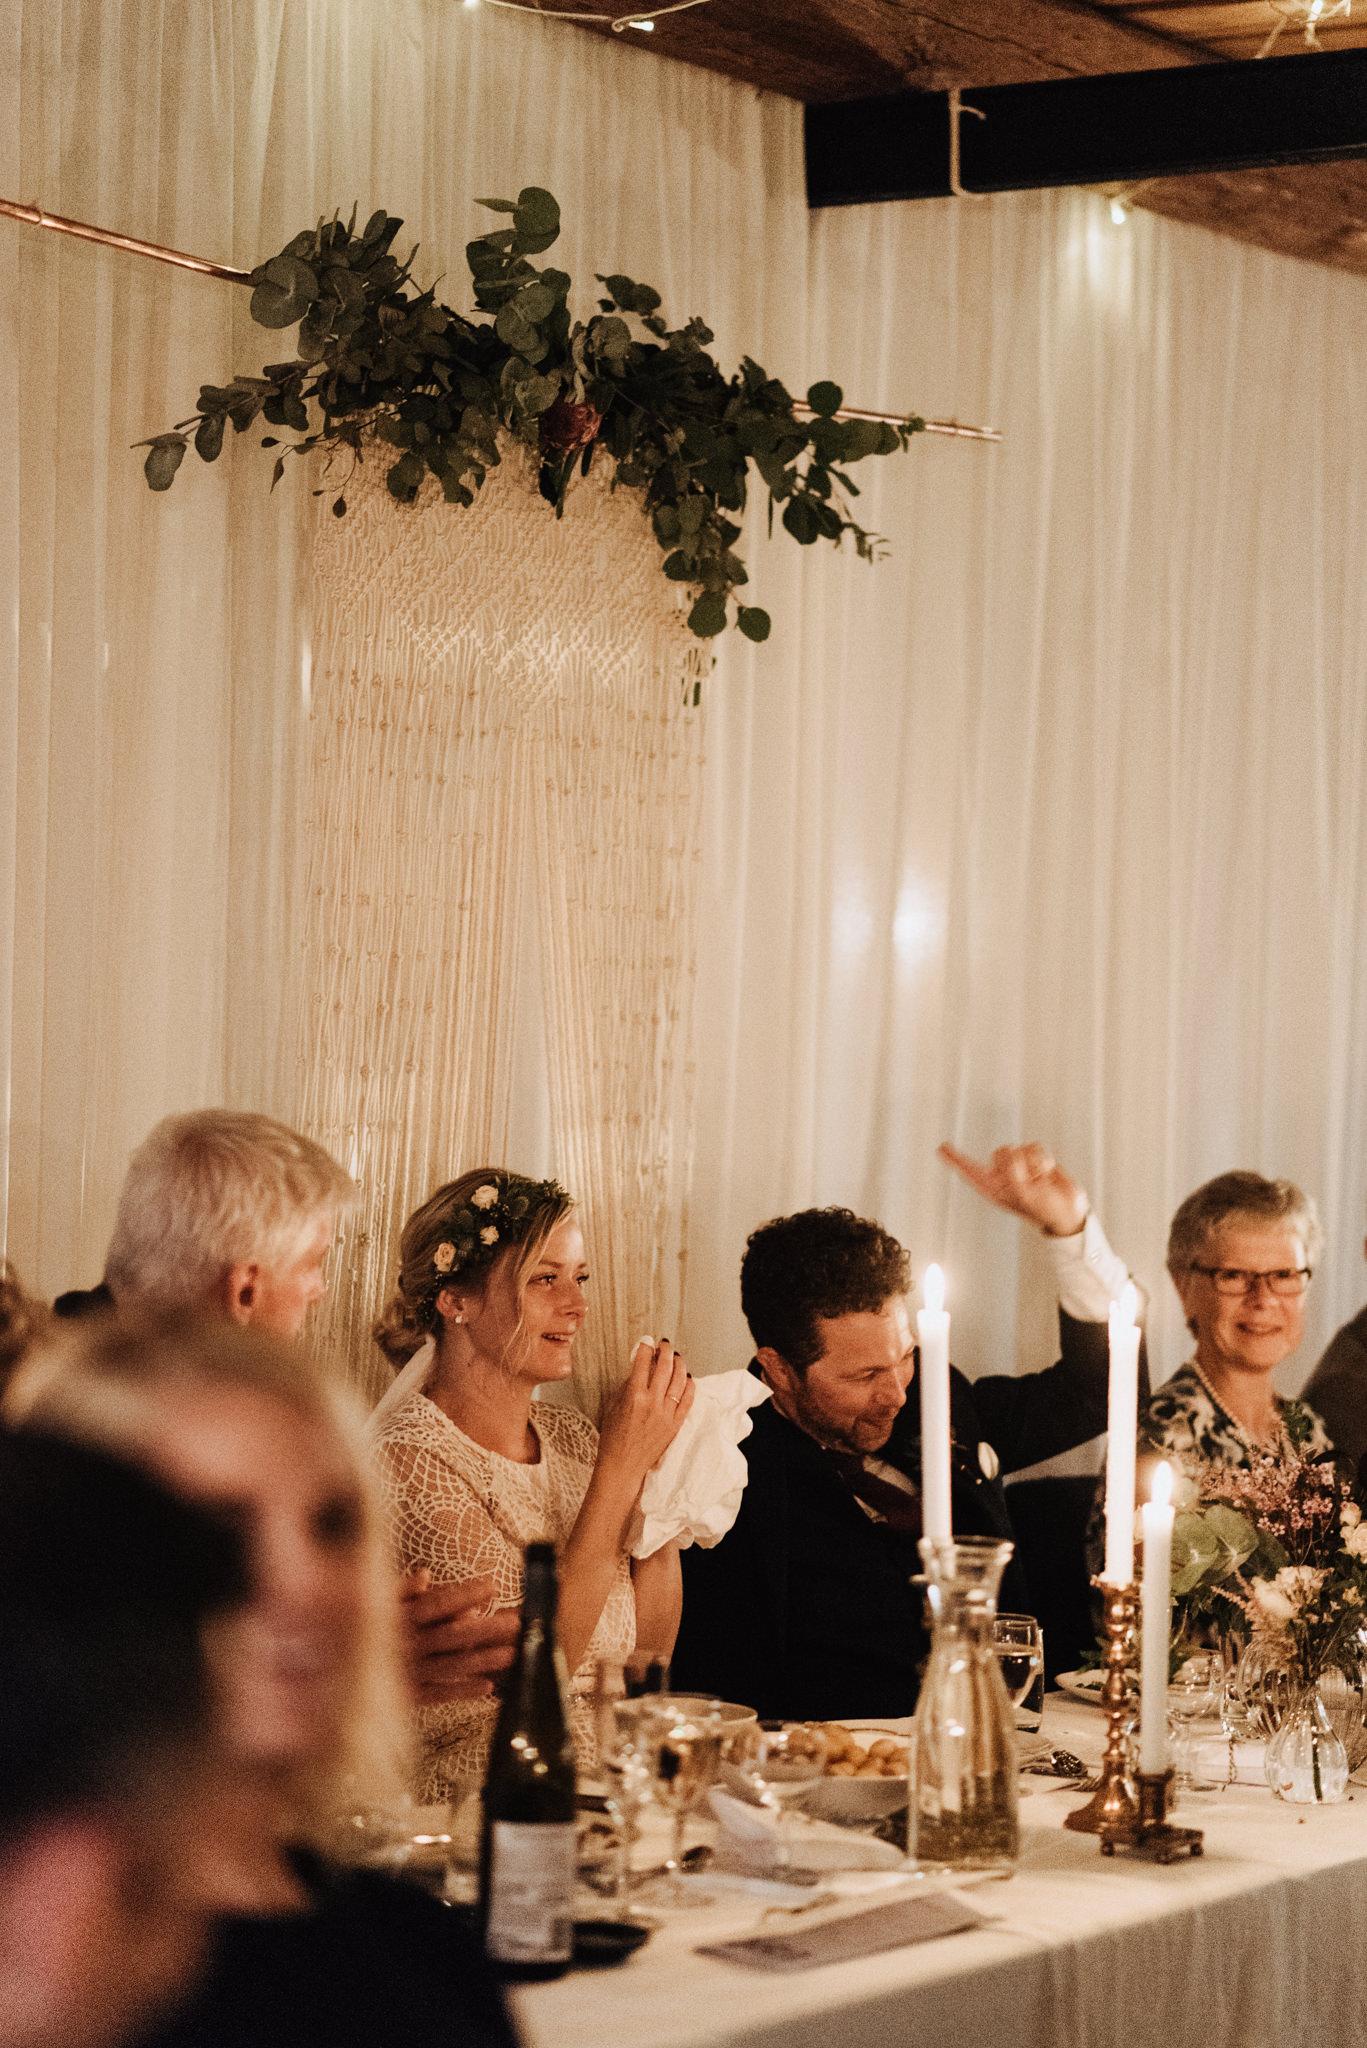 bohemiskt-bröllop-på-nygård-event-i-åstorp-bröllopsfotograf-skåne-180.jpg